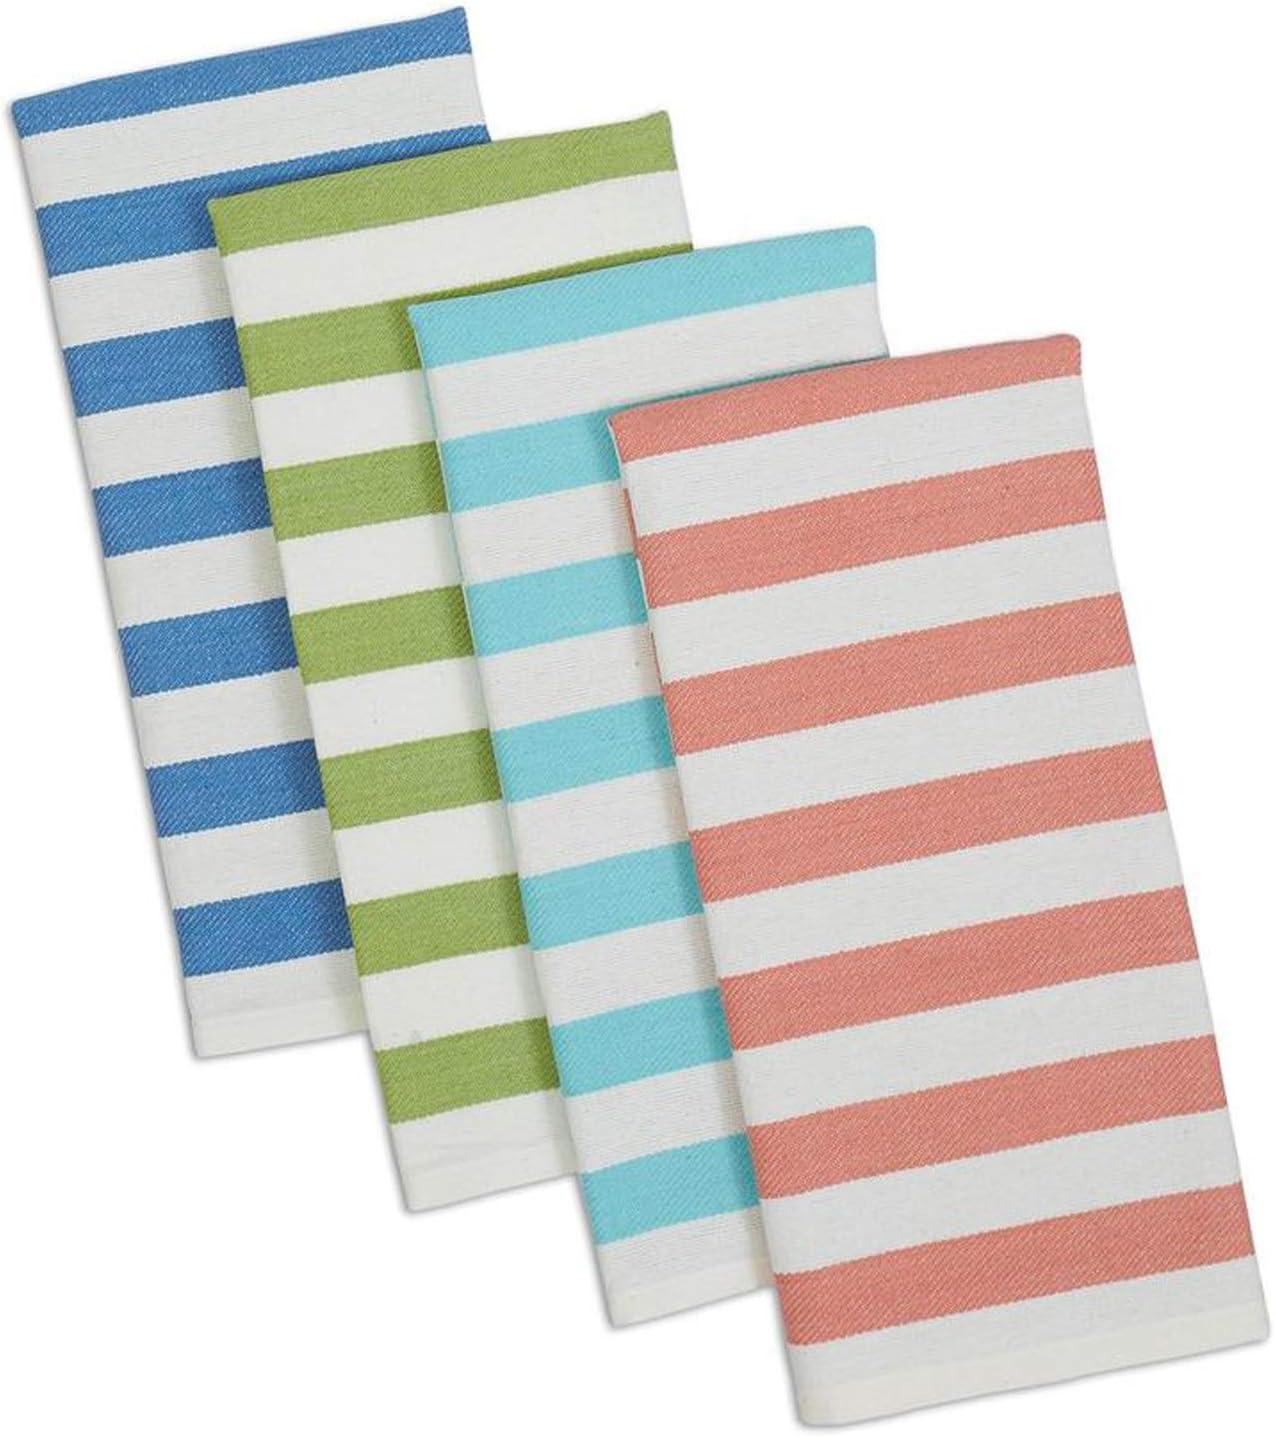 Design Imports Seashore Table Linens, 18-Inch by 28-Inch Dishtowel Gift Set, Set of 4, Cabana Stripe Heavyweight, 1 Blue, 1 Green, 1 Aqua and 1 Coral